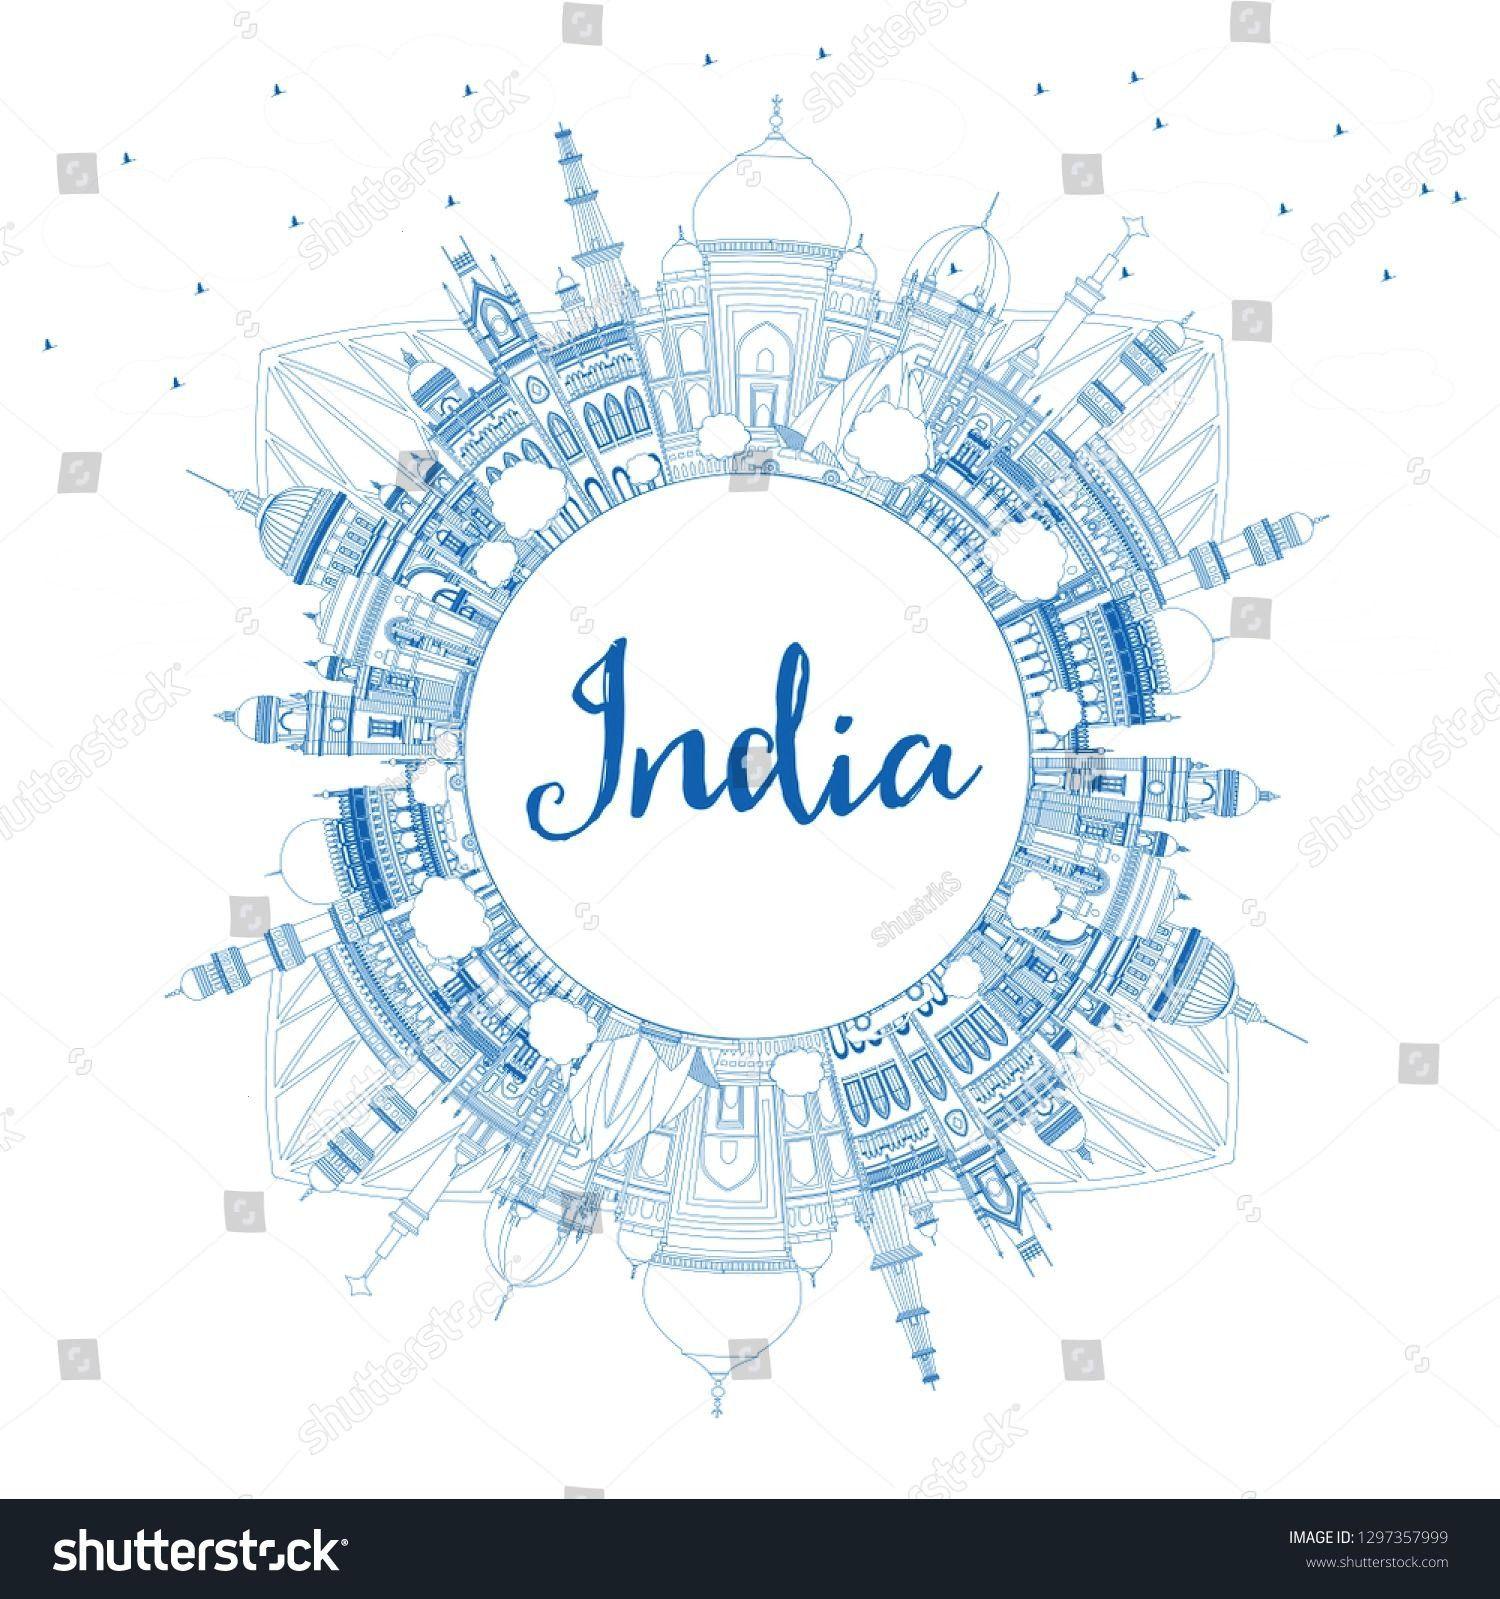 India City Skyline with Blue Buildings and Copy Space. Delhi. Hyderabad. Kolkata. Vector Illustrati